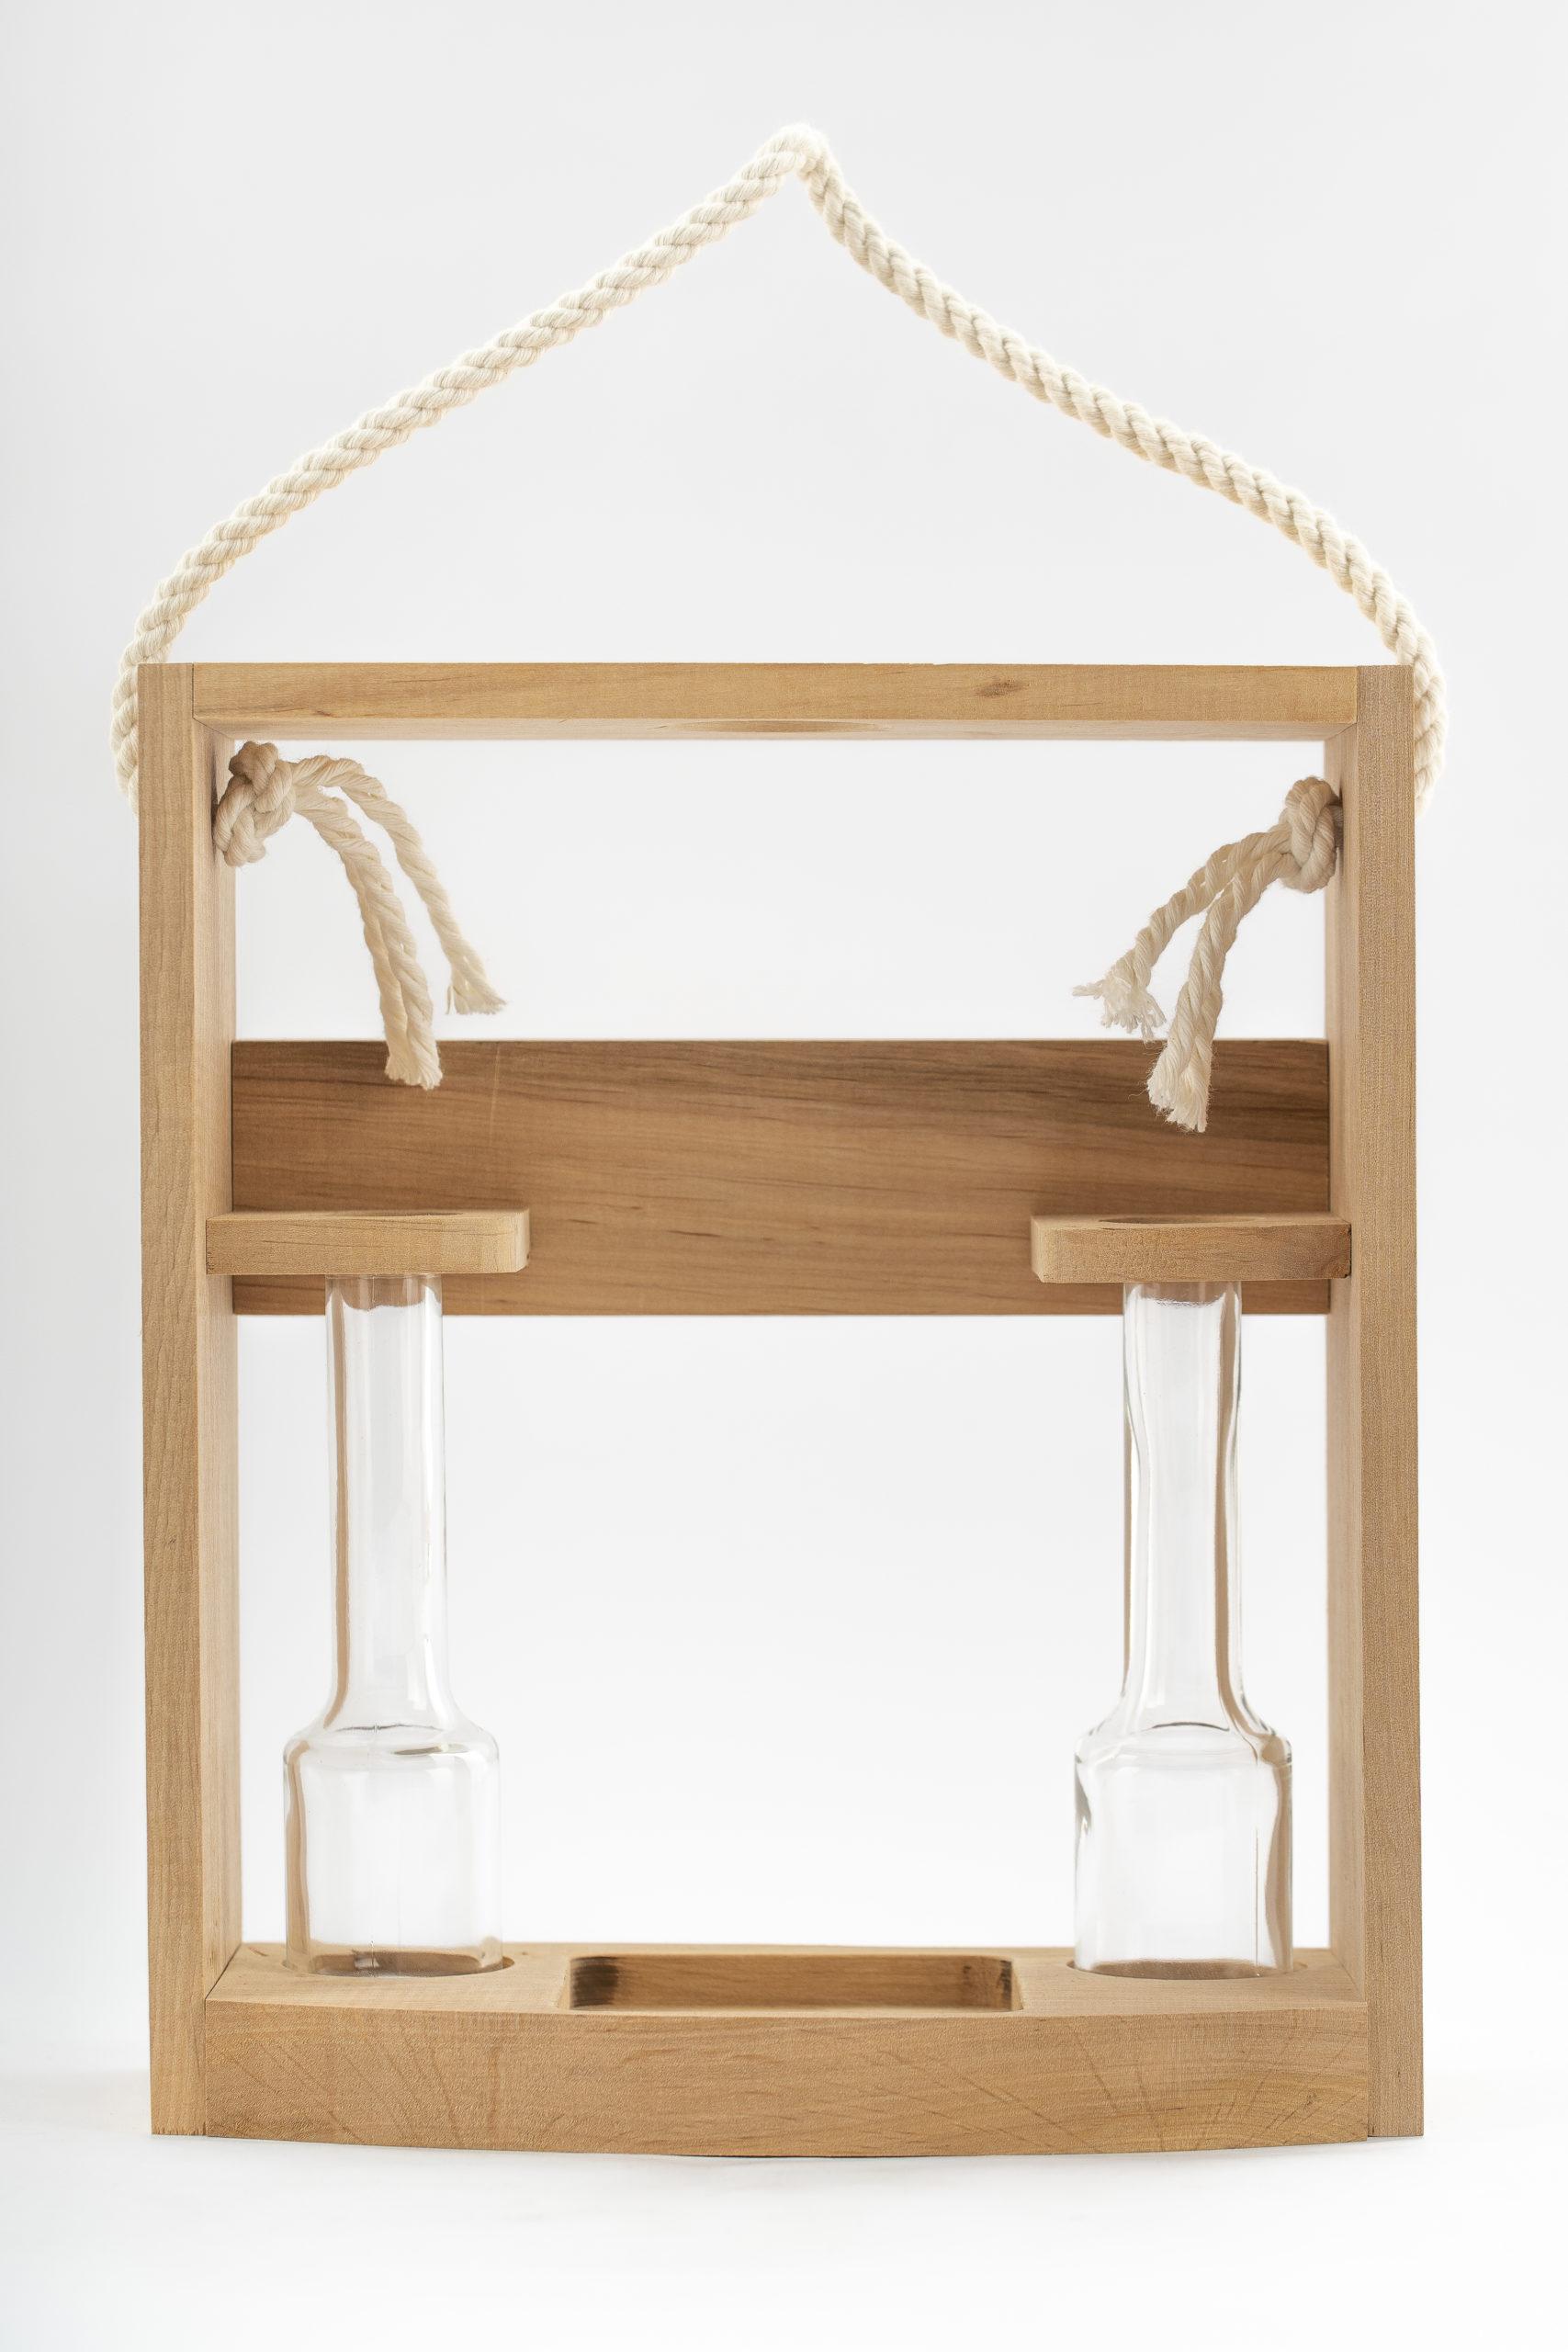 Dreveny stojan s pijackami pre flase Poctive scaled - Drevený stojan s 2 pijačkami